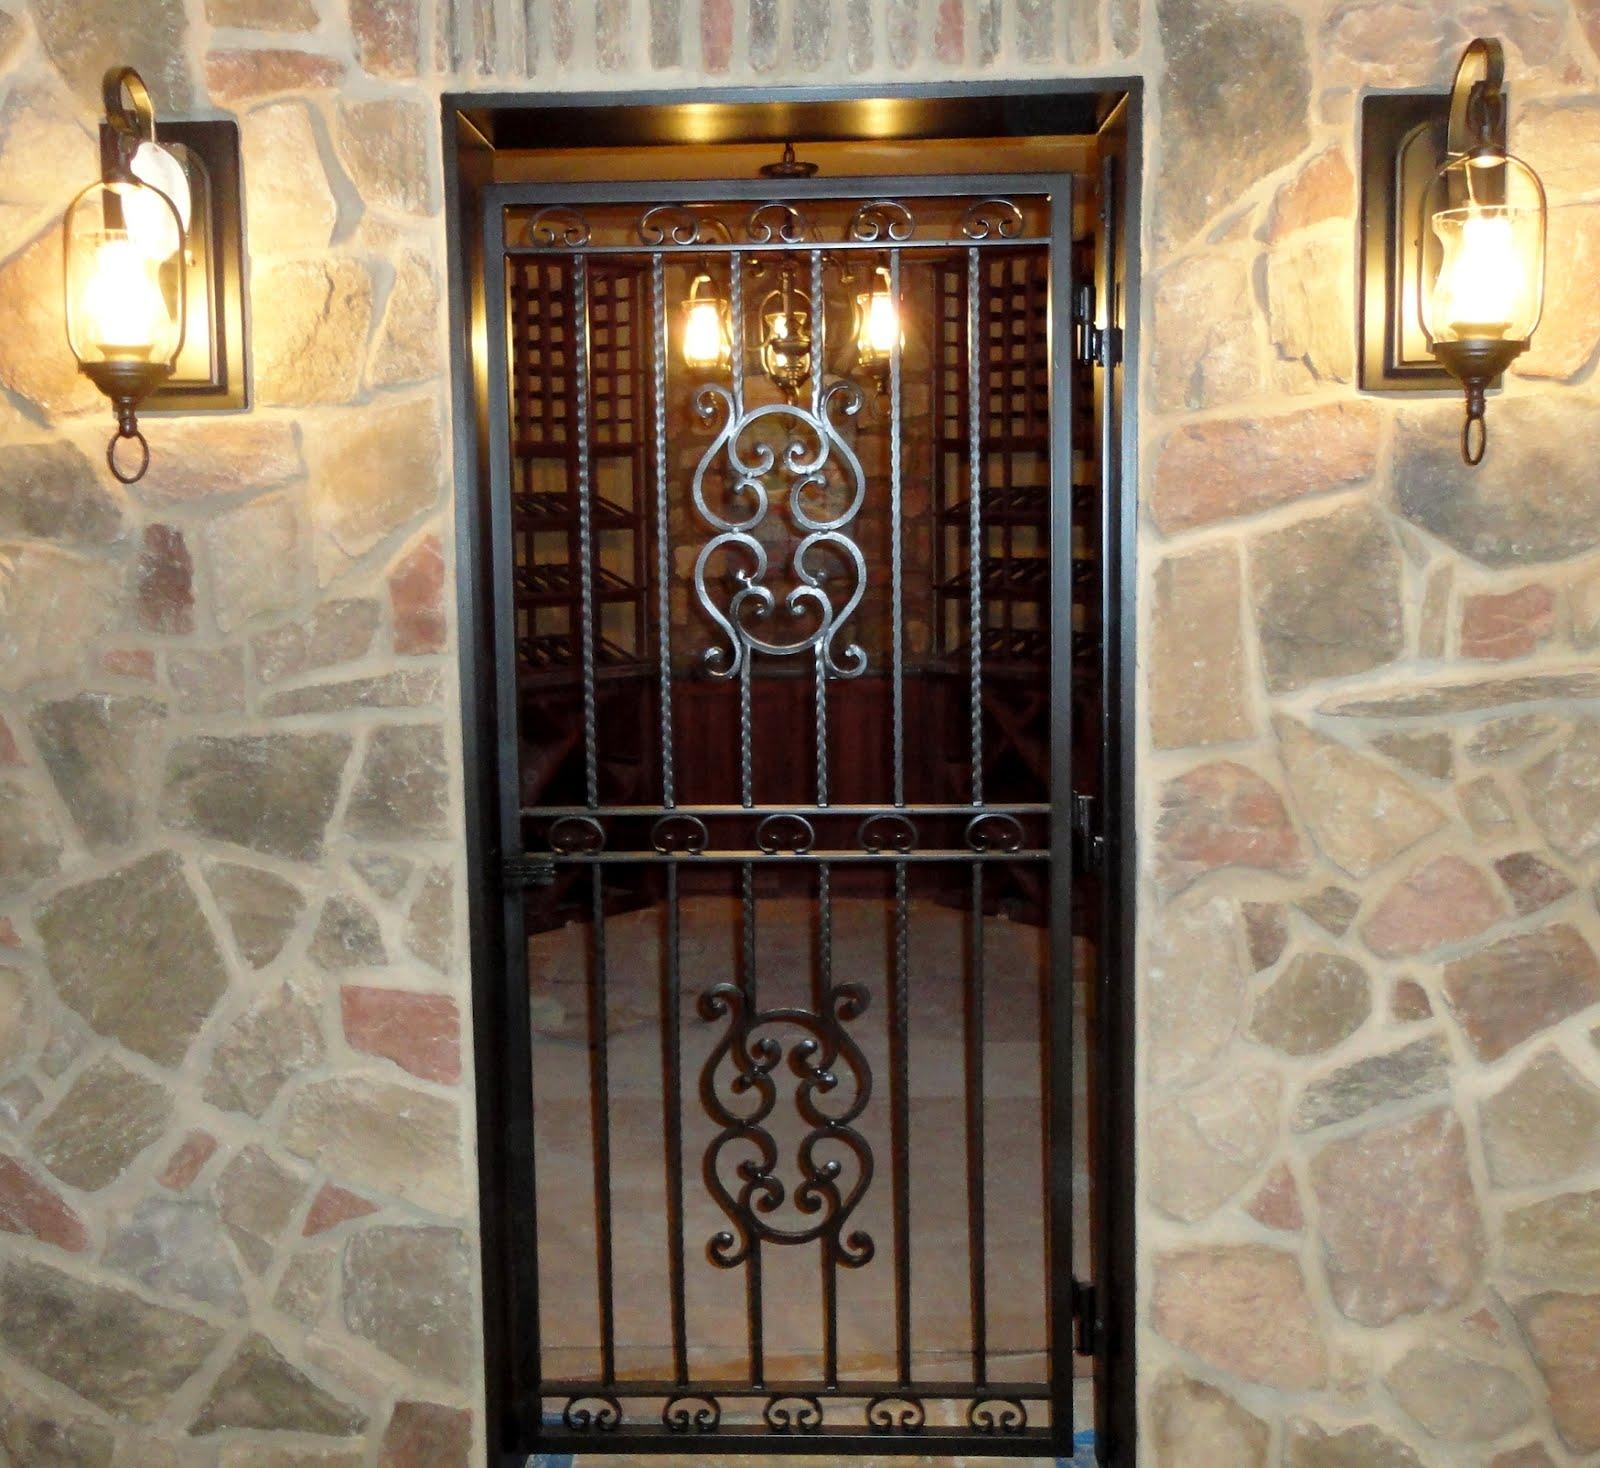 De luco architectural metals wine cellar gate